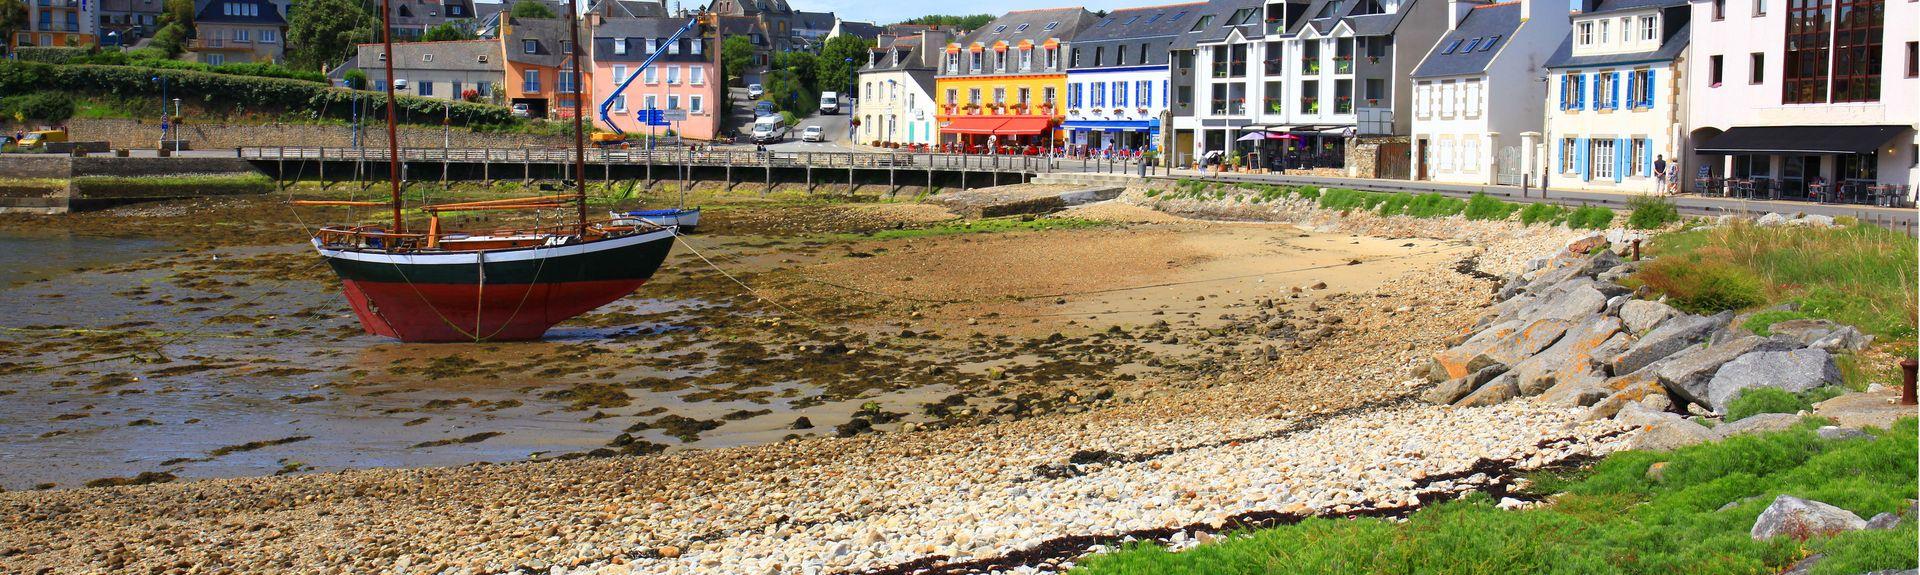 Camaret-sur-Mer, Finistère, Frankreich